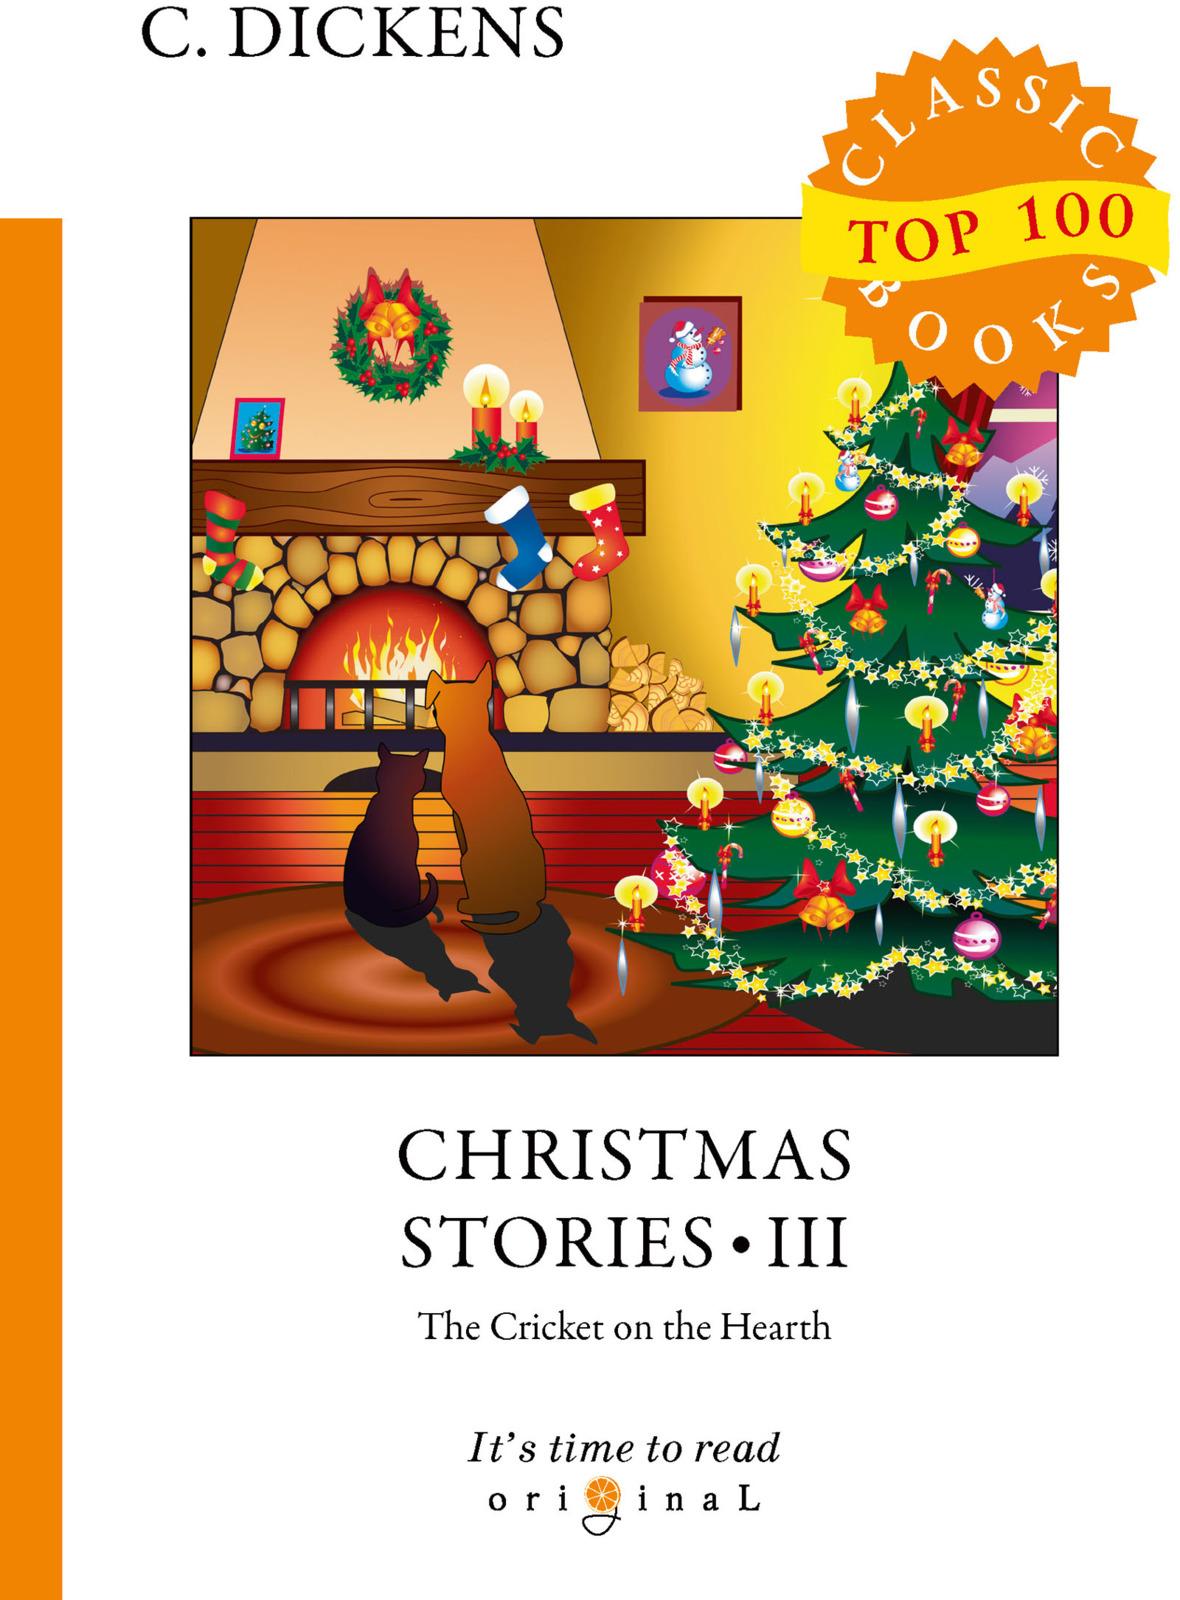 C. Dickens Christmas Stories III dickens c christmas stories the cricket on the hearth рождественские истории сверчок за очагом на англ яз